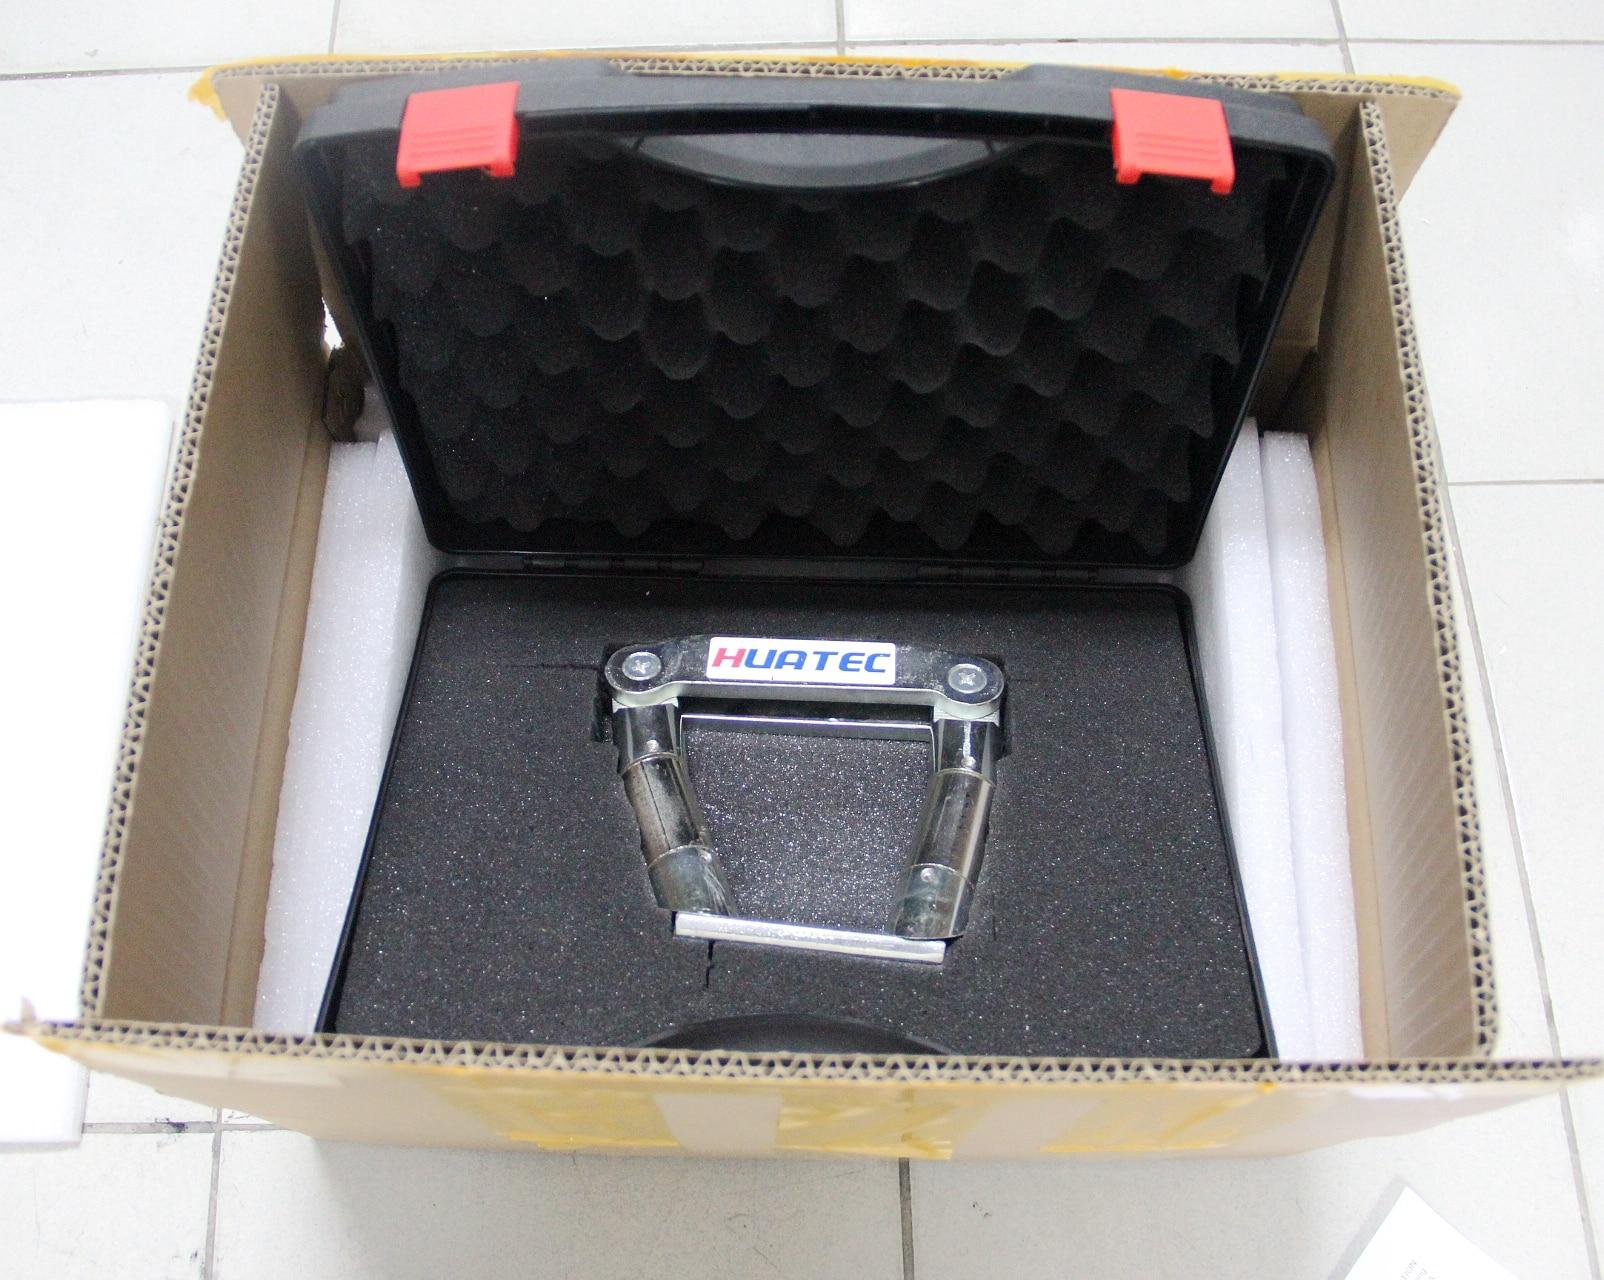 HUATEC 2021 New Permanent Magnetic Particle Testing , Handy Yoke Flaw Detector Yoke kit HCDX-300 enlarge